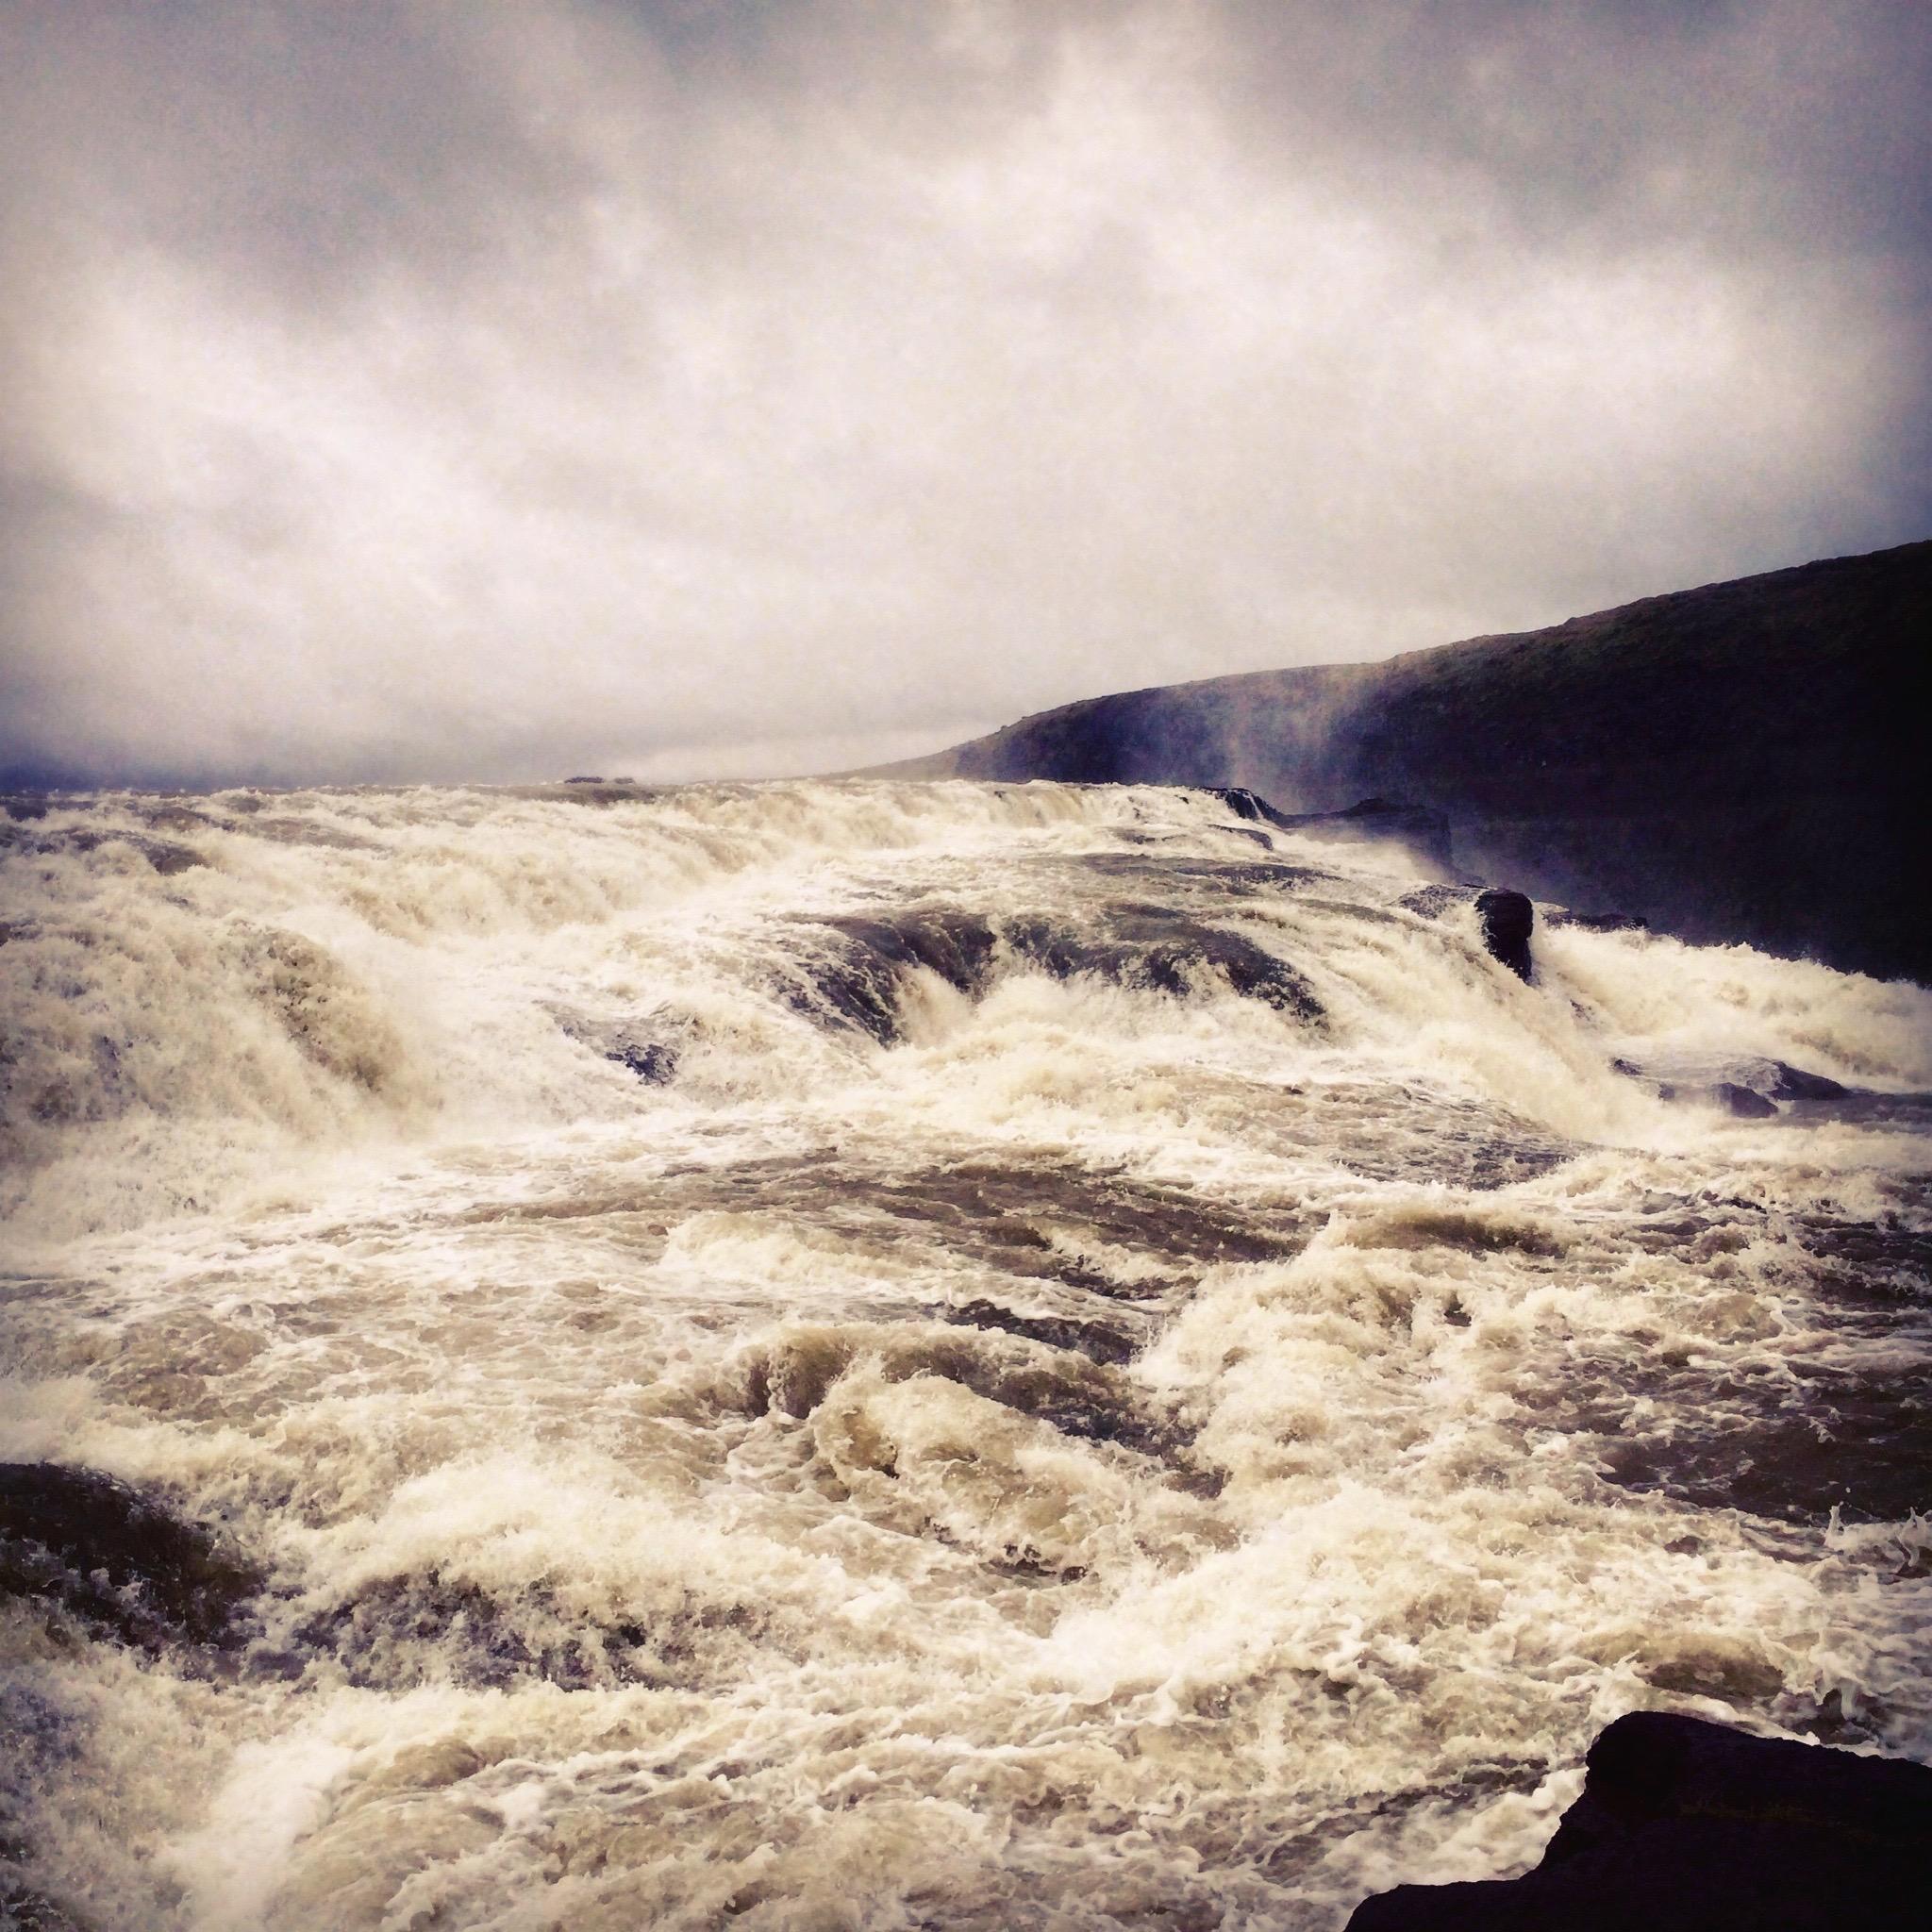 Gullfoss Waterfall, Iceland - 3 Days*